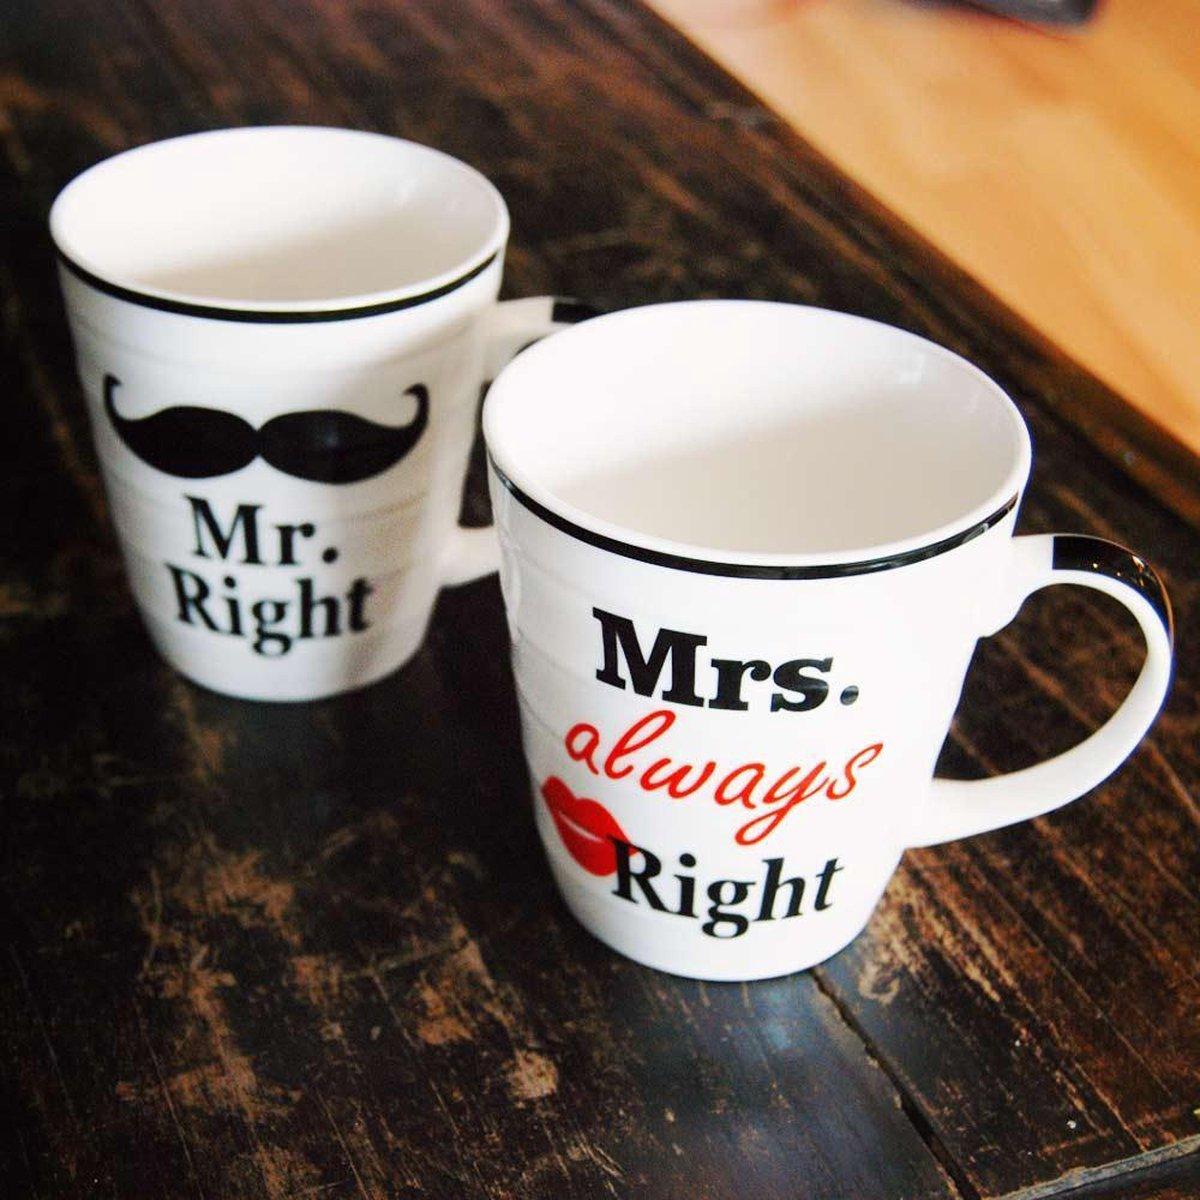 Mr. & Mrs. Right bekers - Beker - 2 Stuks - Out of the Blue